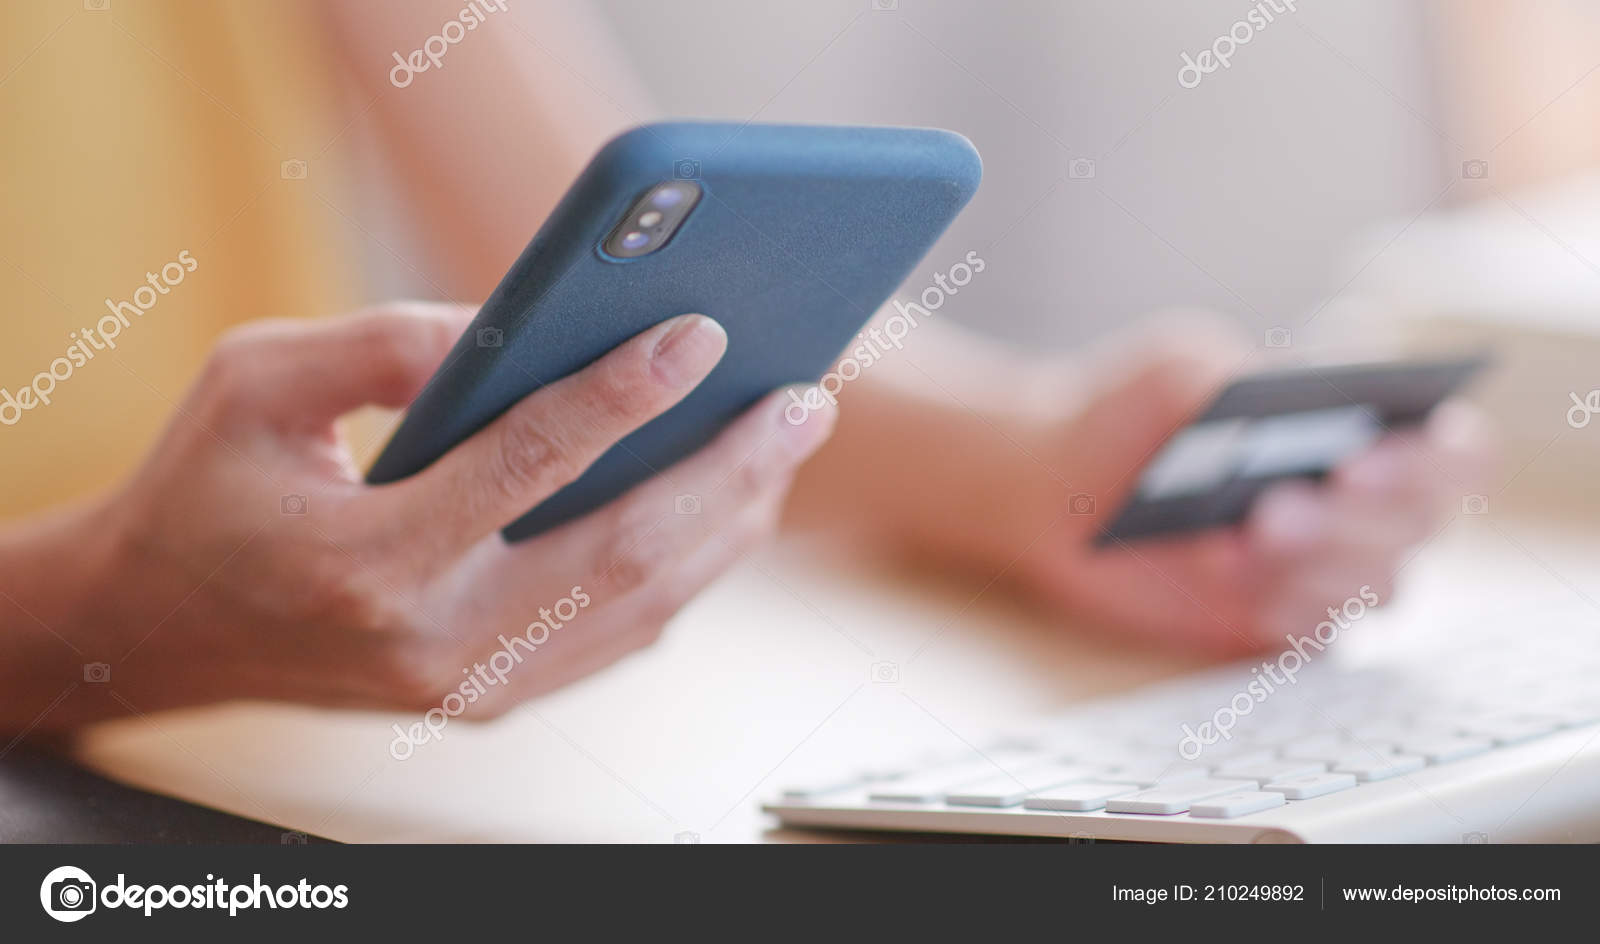 8cc00245d2c2 Χρήση Κινητών Τηλεφώνων Καθώς Και Πιστωτική Κάρτα Για Online Αγορές — Φωτογραφία  Αρχείου